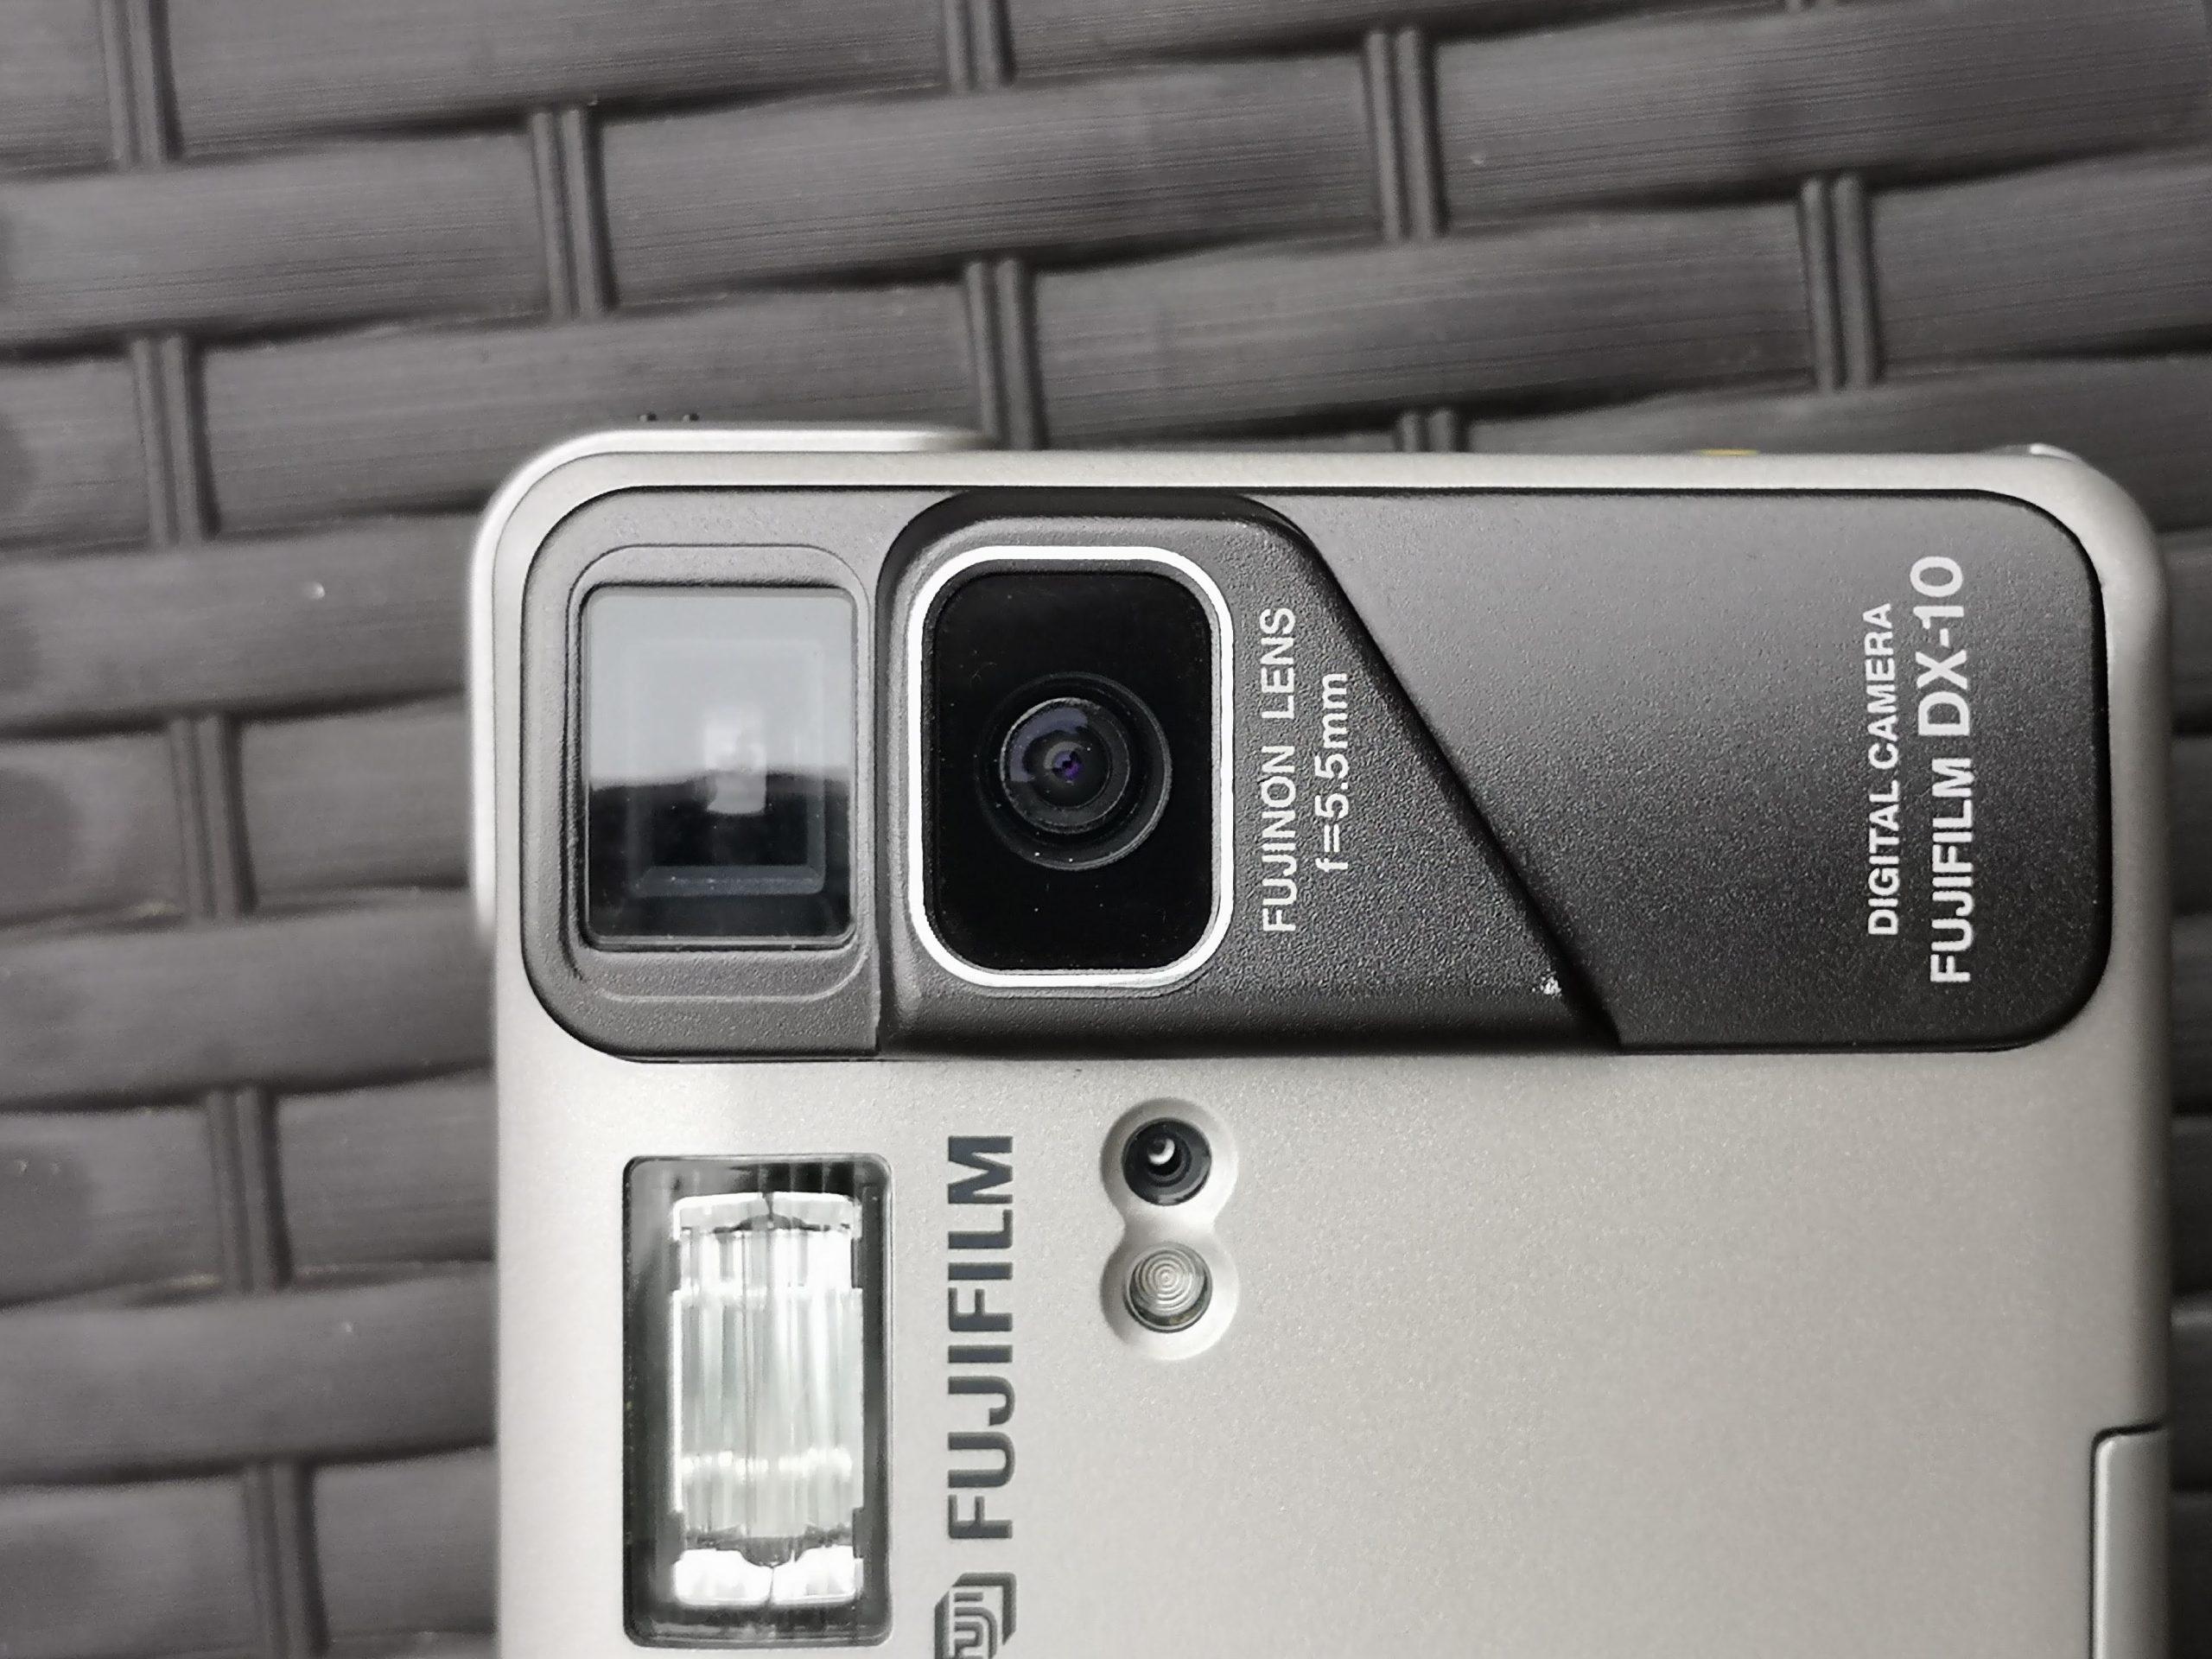 Lens & Viewfinder complex on DX-10